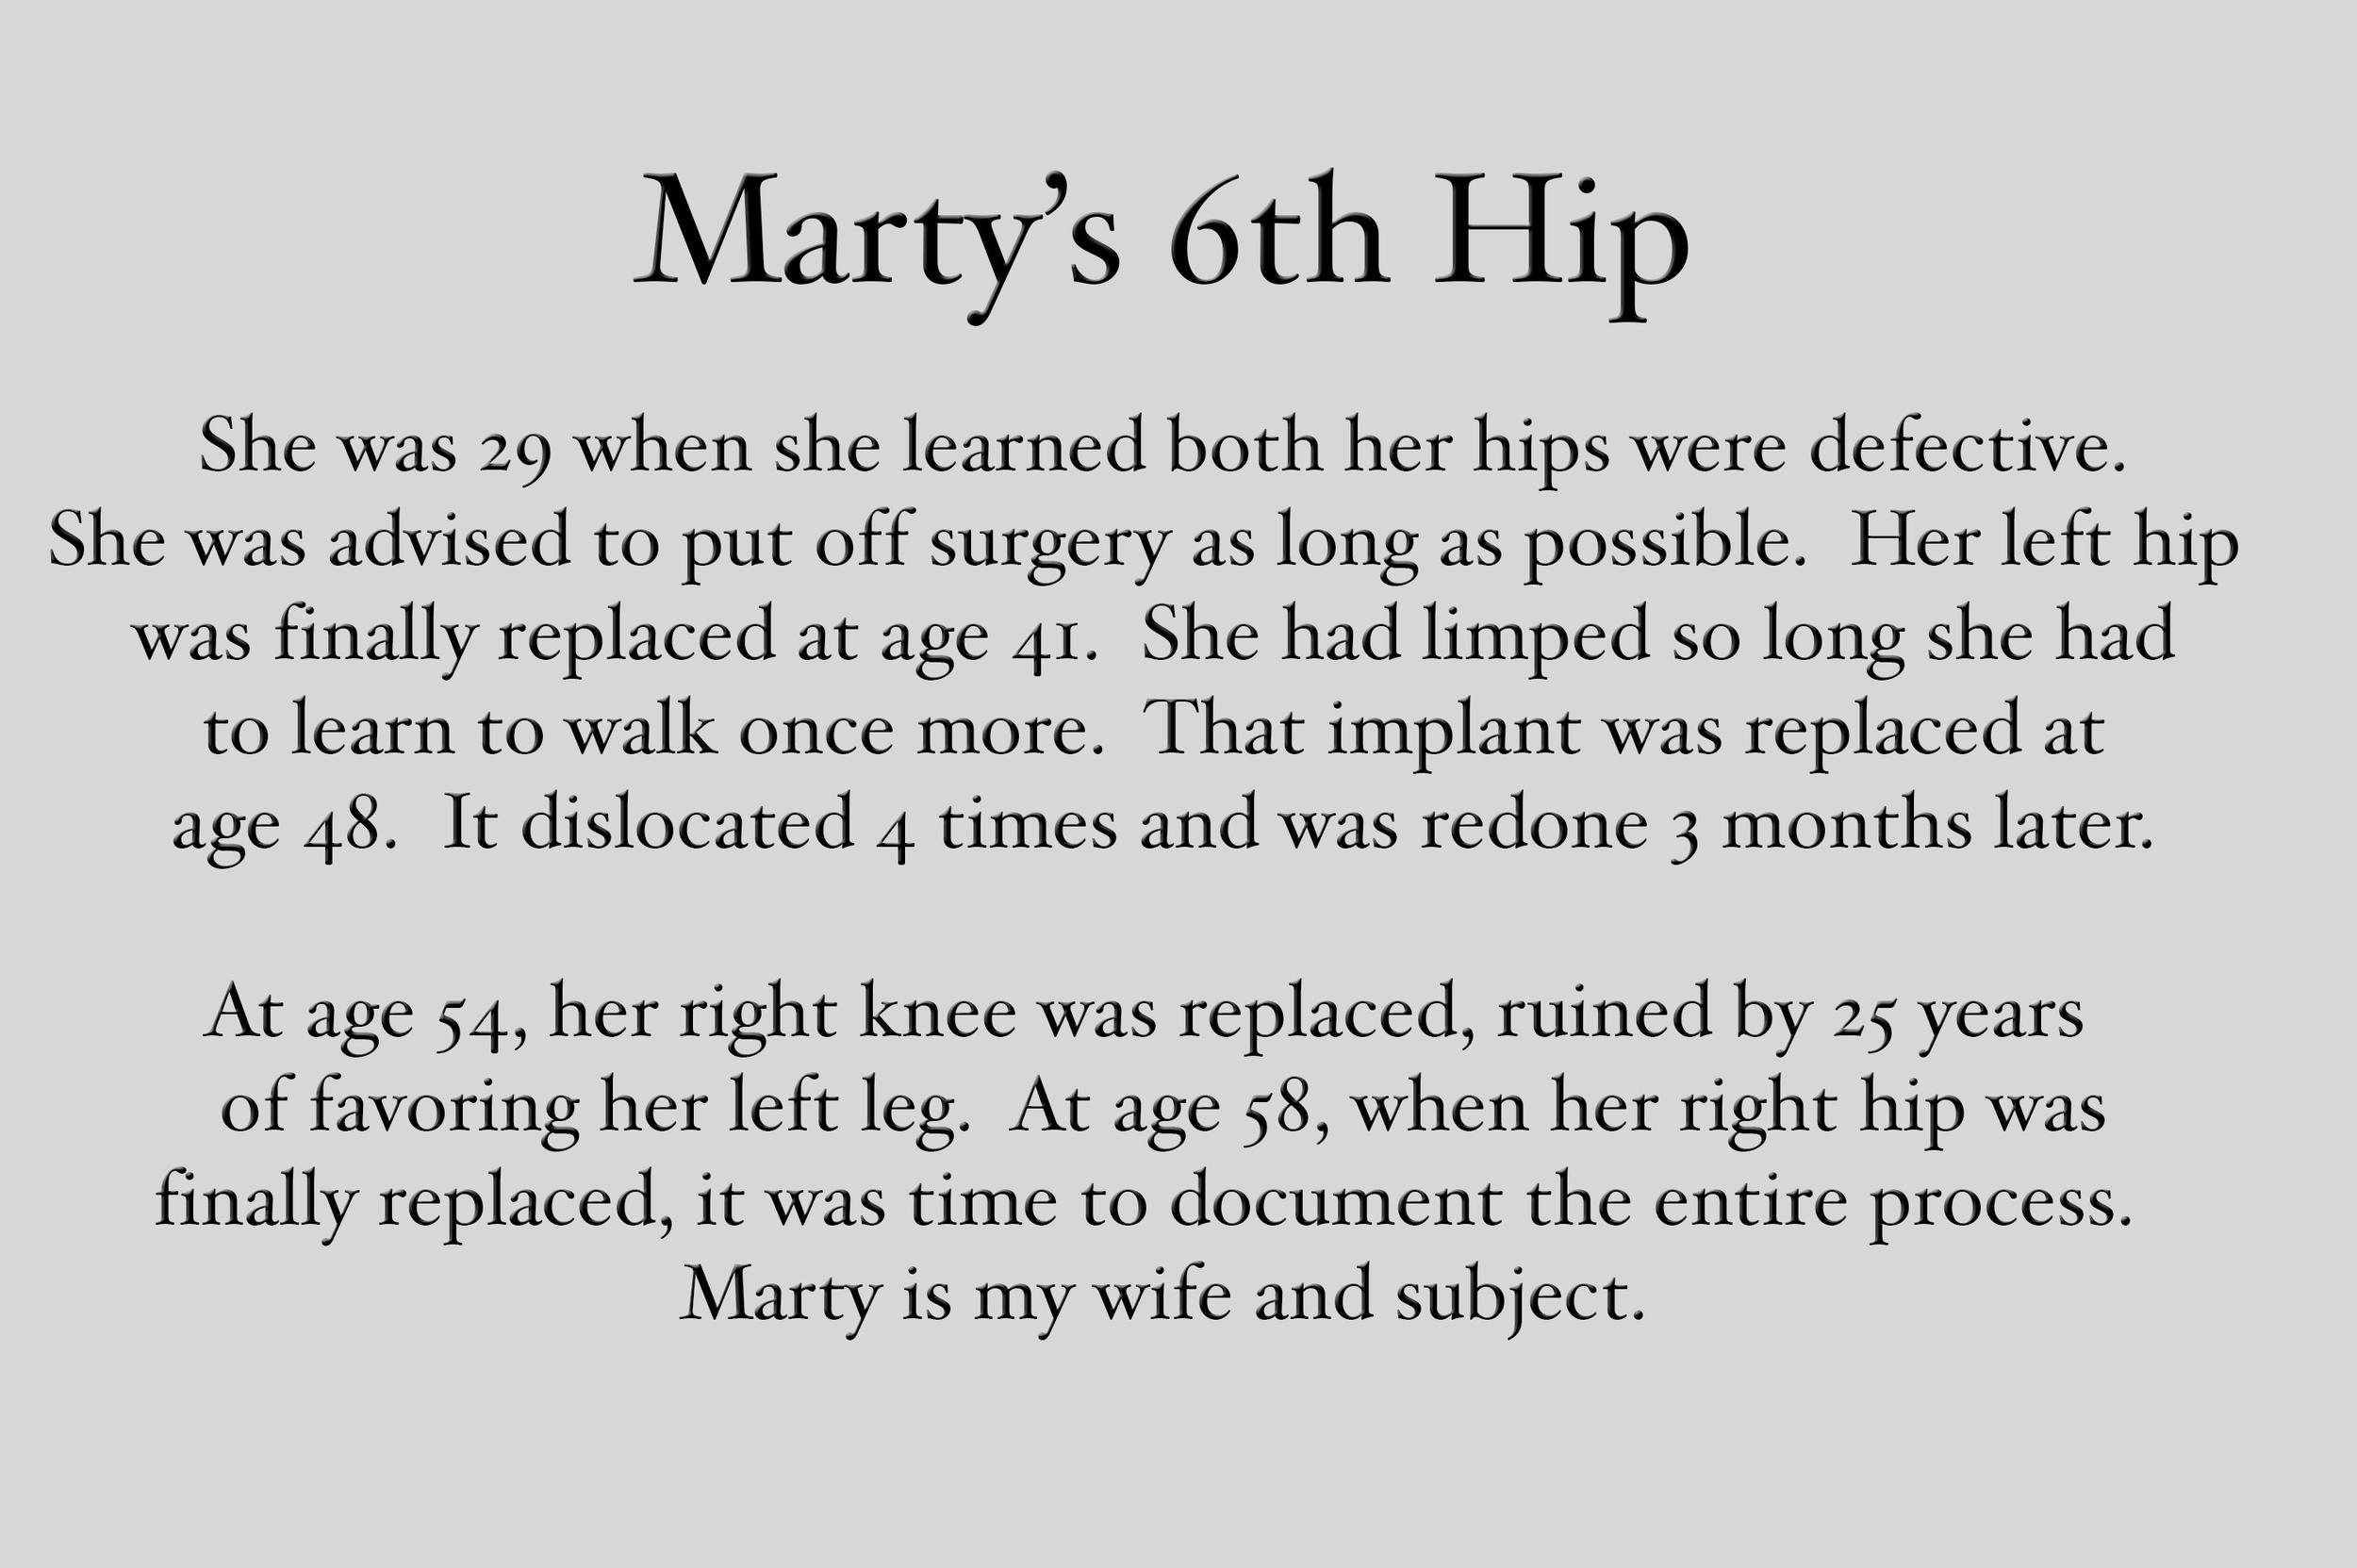 Marty's 6th Hip Title Slide 2.jpg